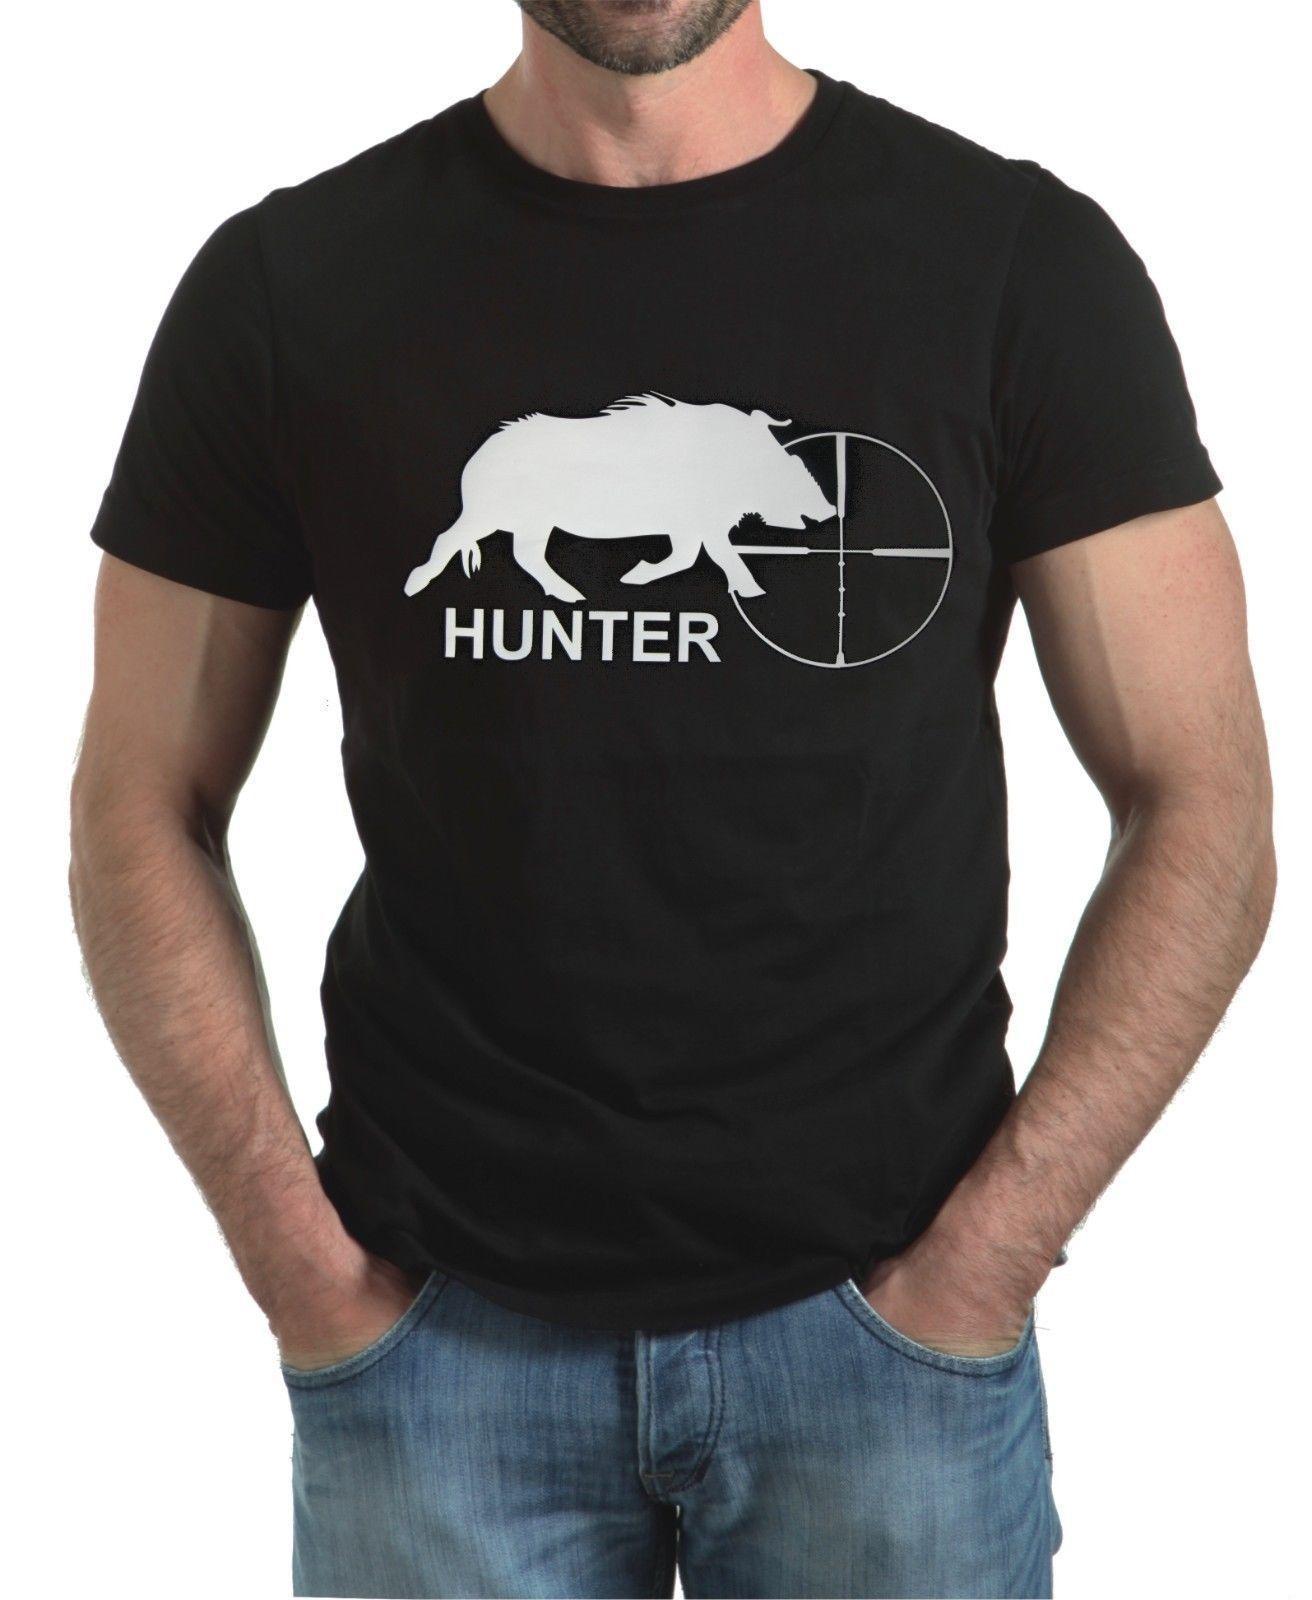 9fe8a6e76cfbe WILD BOAR HUNTING SHOOTING T SHIRT Awesome Shirt Design Free T Shirts From  Blastgear, $11.01| DHgate.Com